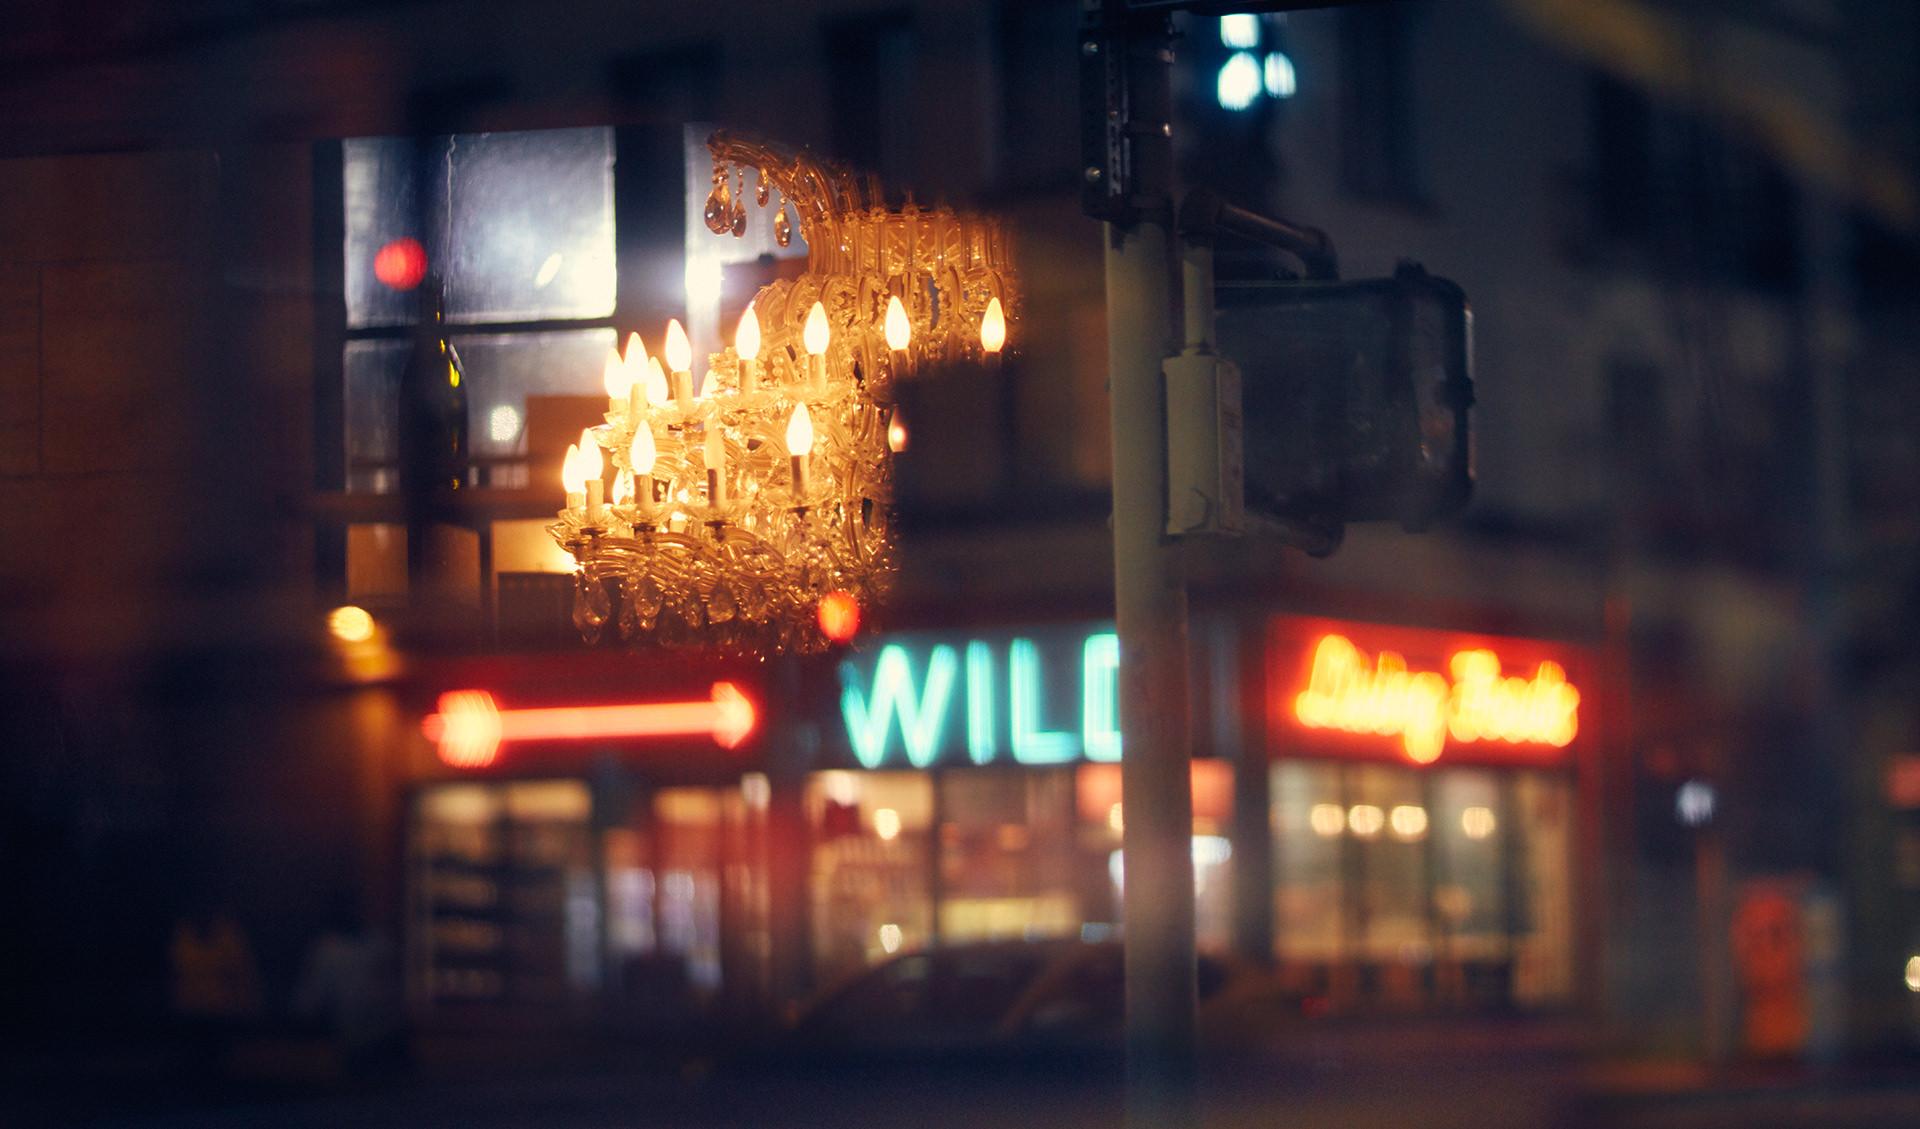 ©ankeluckmann1911p, ©Mercedes Benz X-Klasse, Anke Luckmann, ©ankeluckmann, campaign, LLR, kai tietz, X class, people, lifestyle, mood, reflection, wild